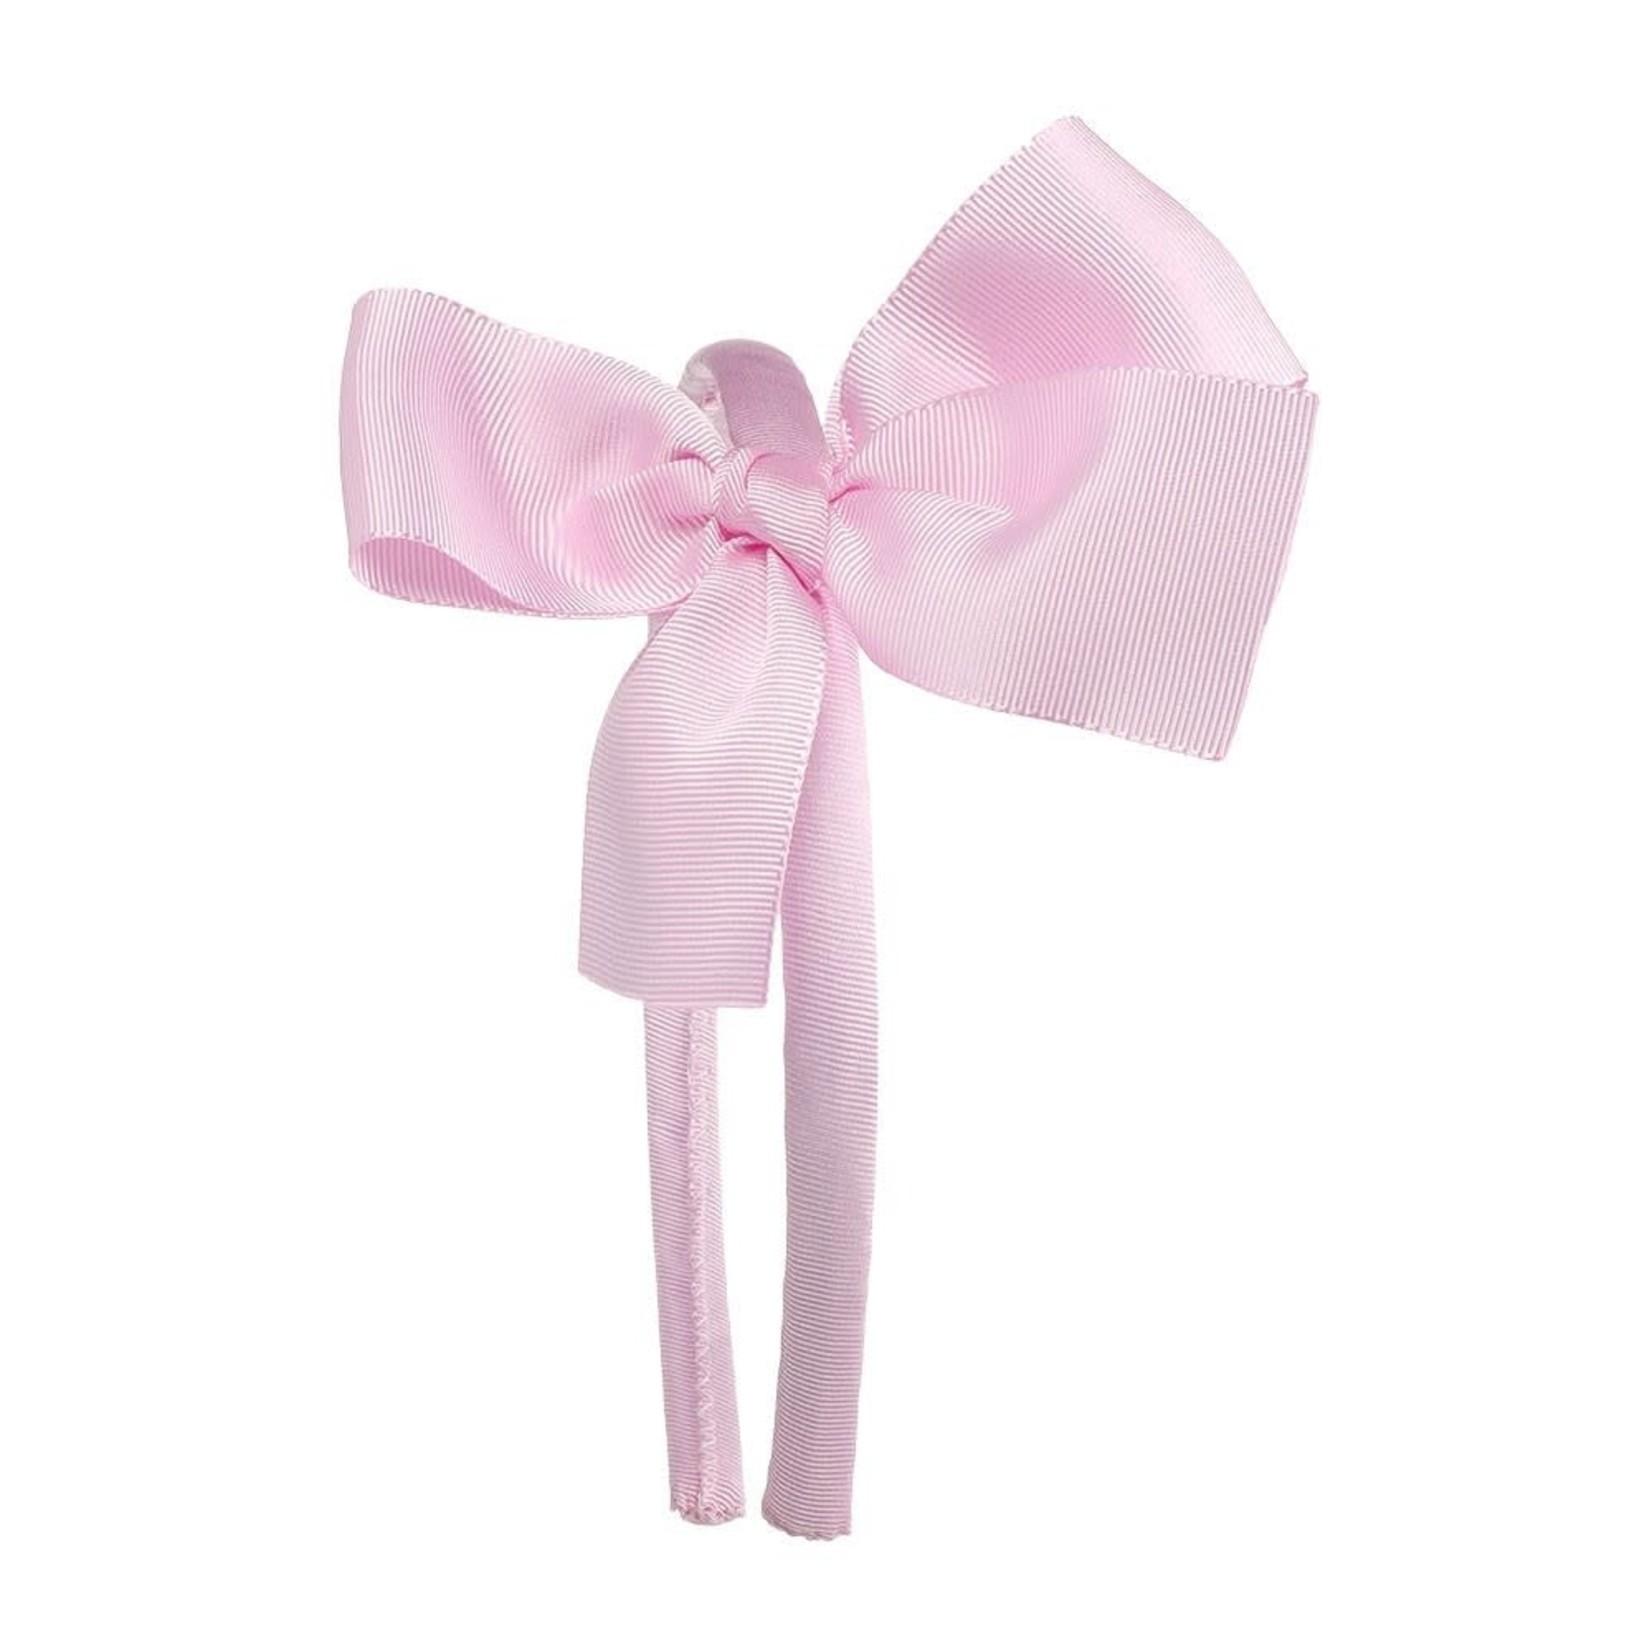 Siena Diadeem Large Bow - Pink